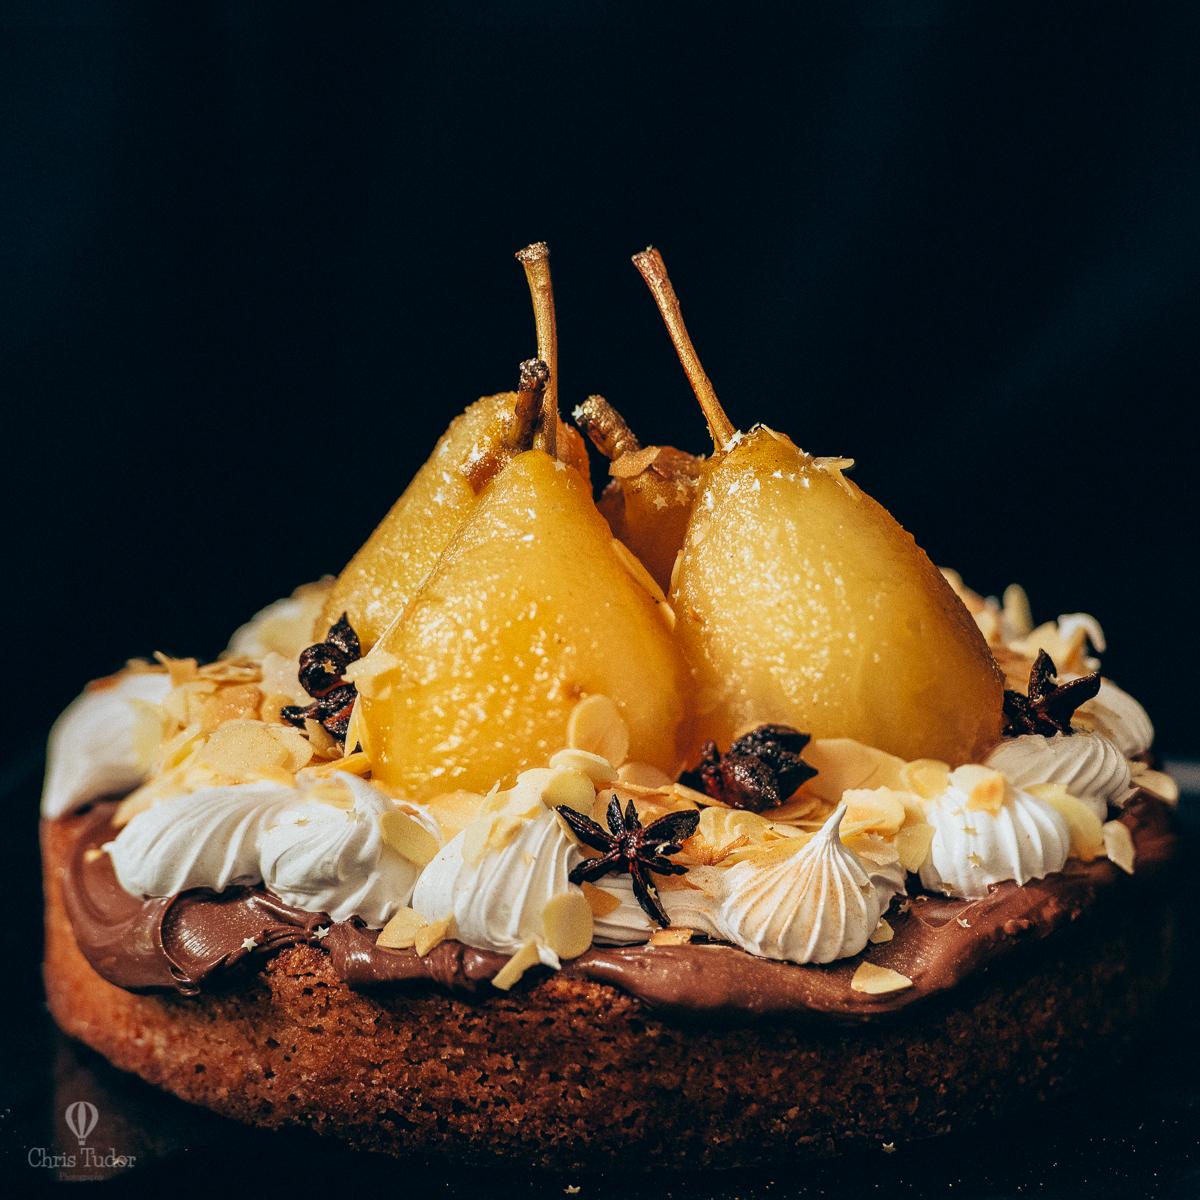 cristina-tudor-food-photography (37).jpg